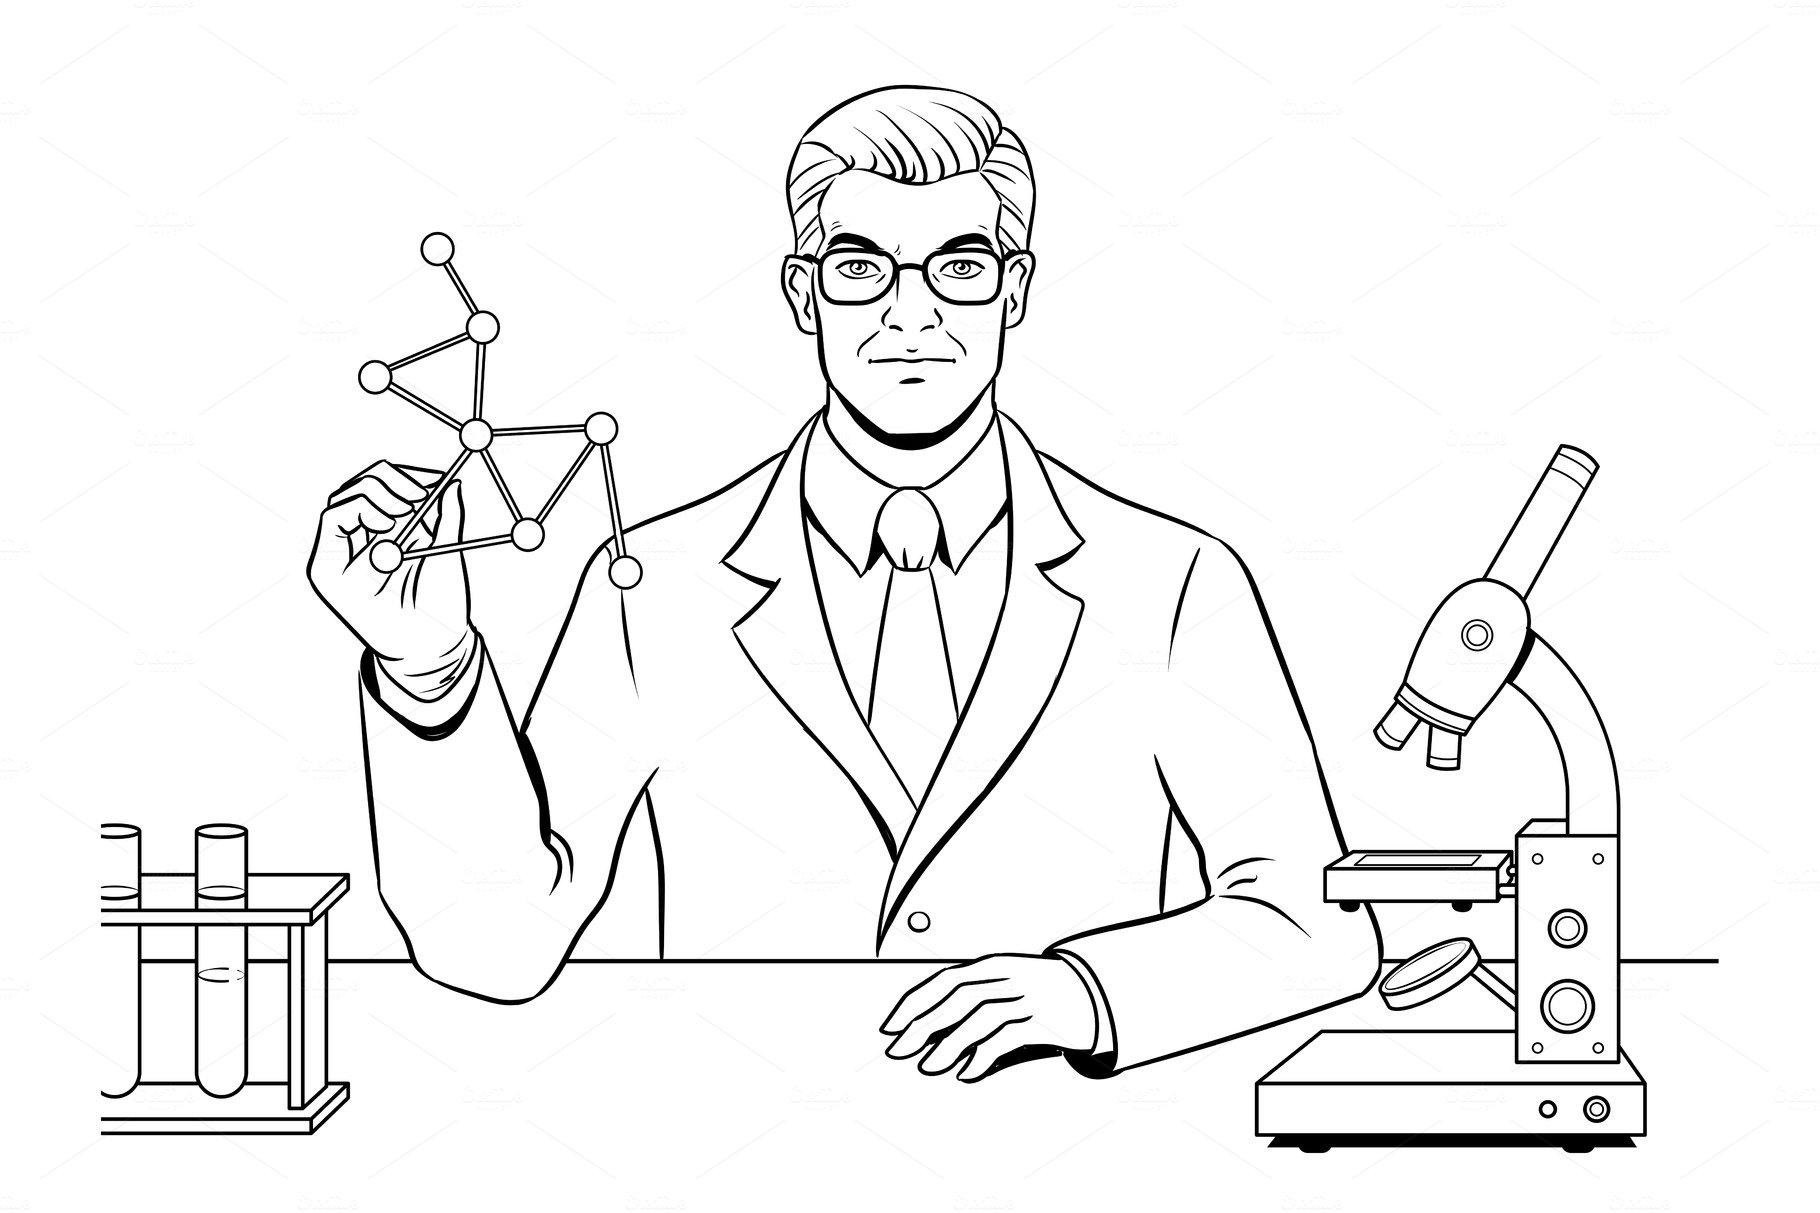 Medical chemist scientist coloring book vector